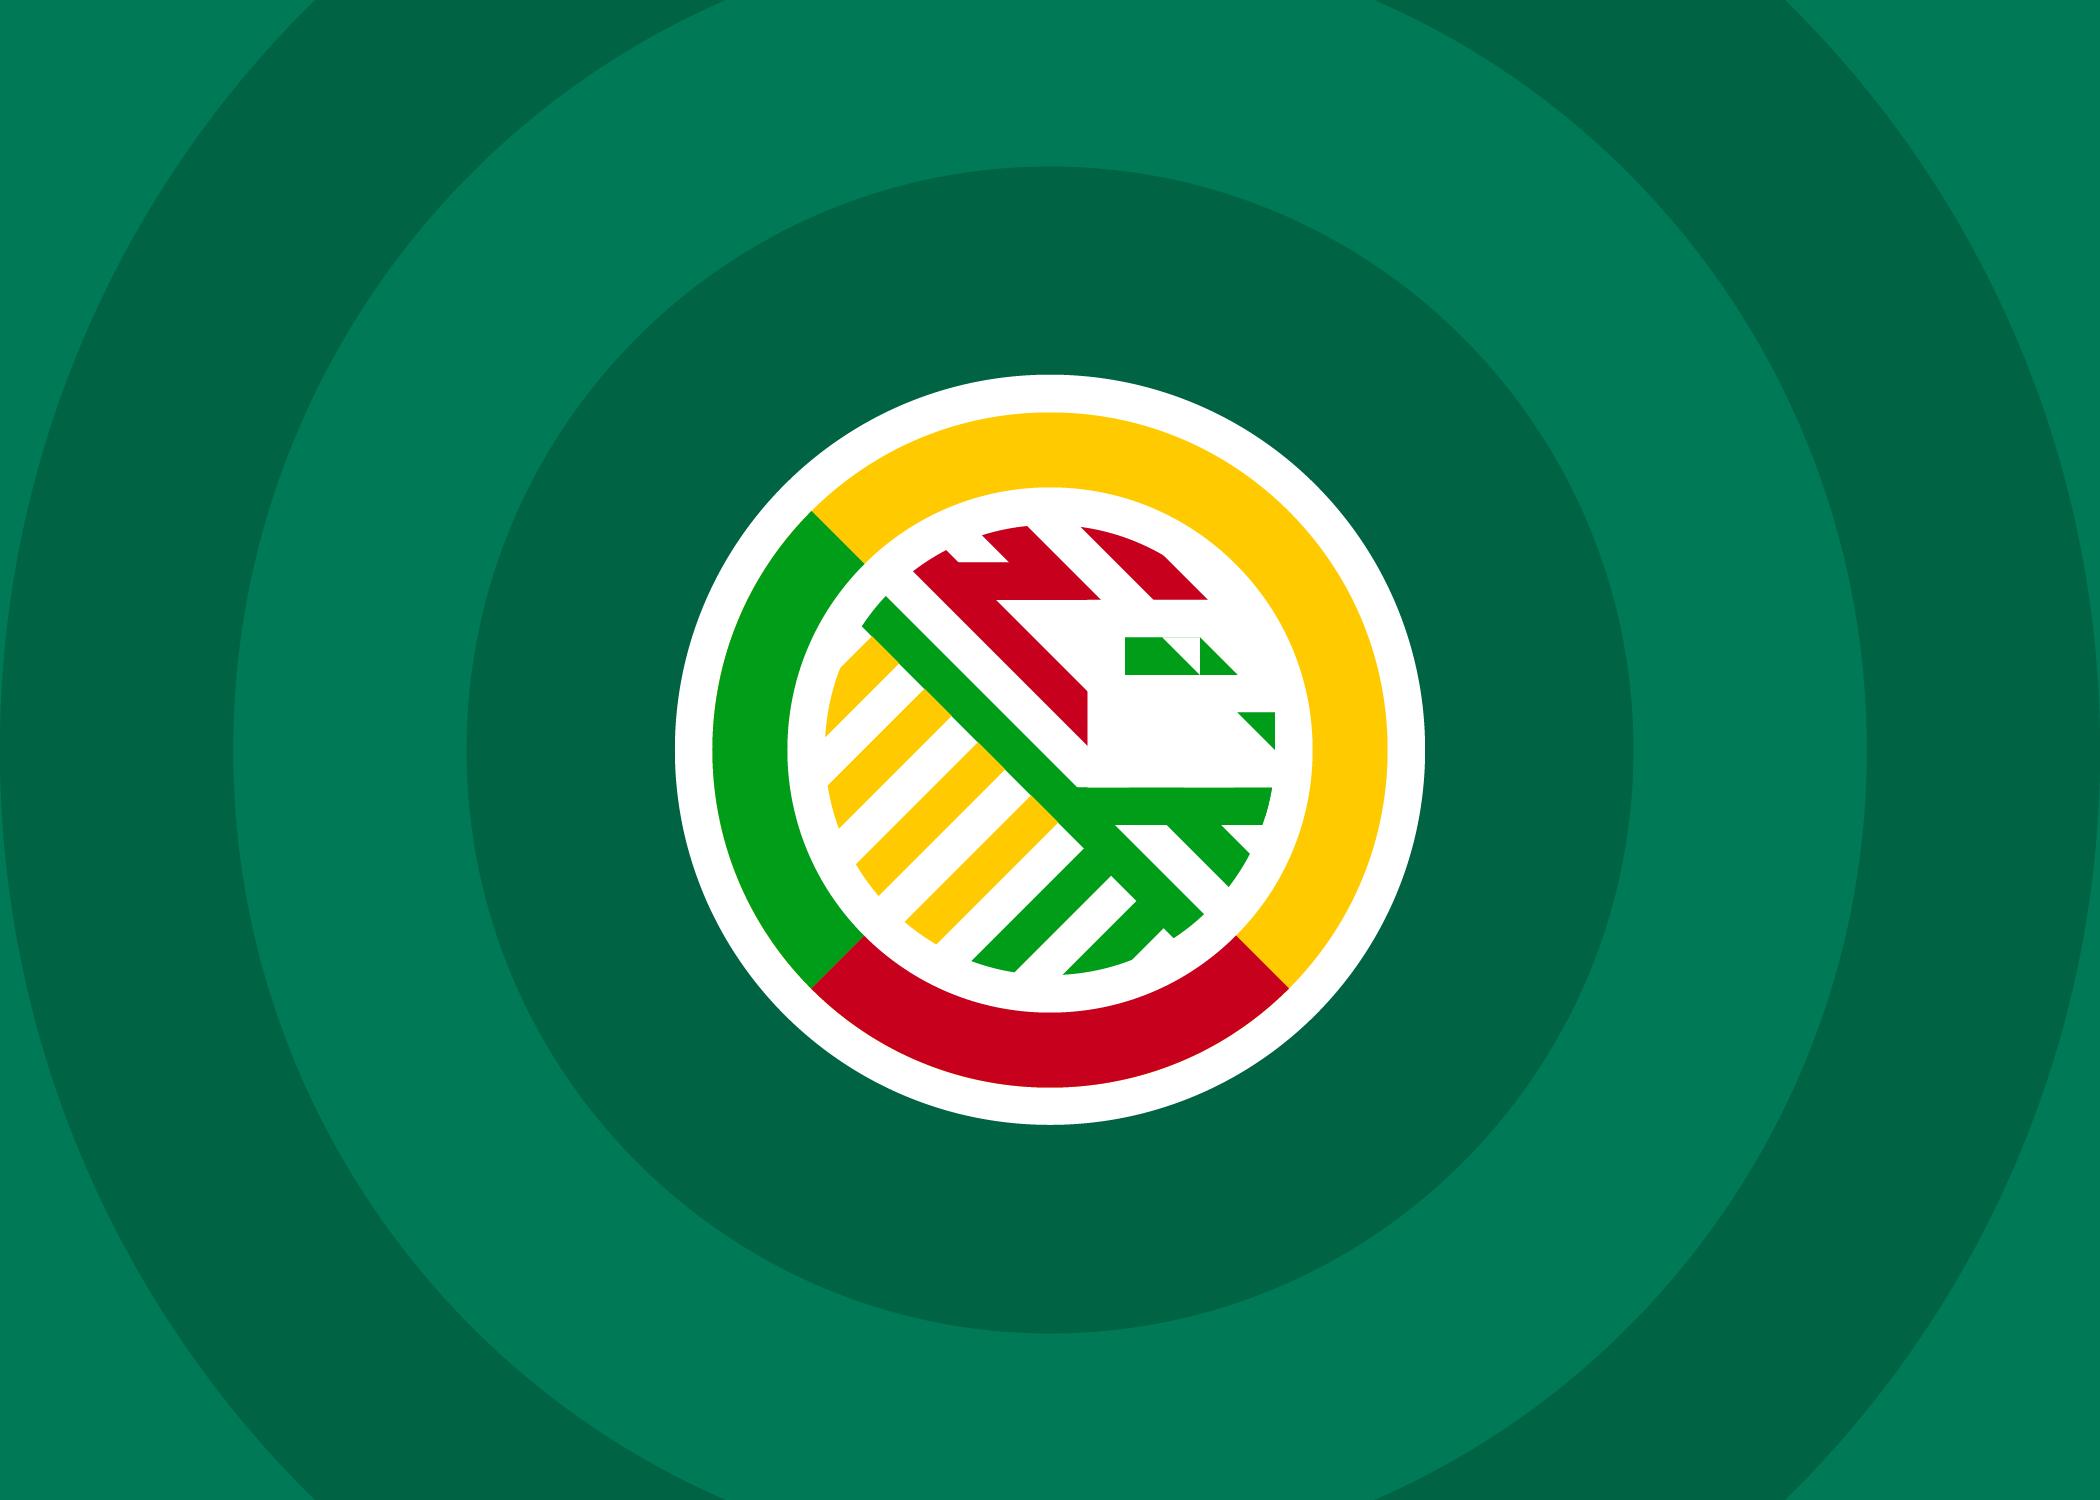 Senegal-2-Geometric-World-Cup-Football-Badge-01-Logo-Design-Freelance-Kent.png